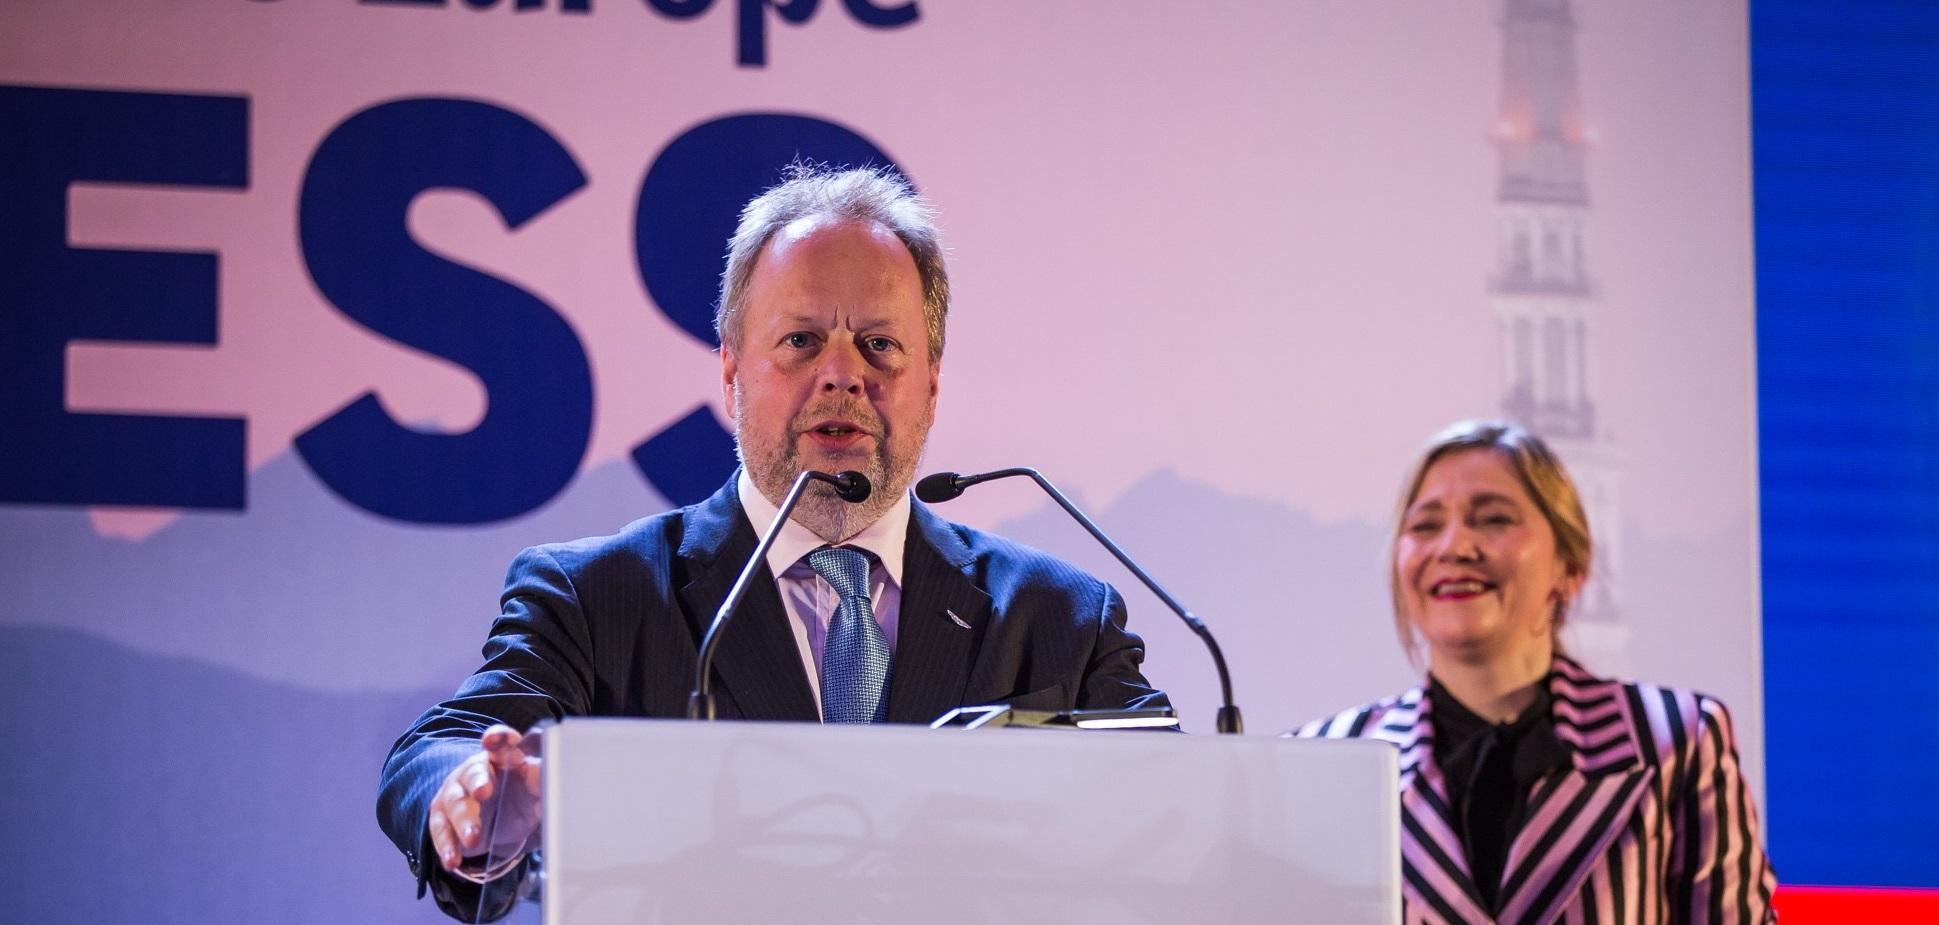 Bývalý šéf značky Aston Martin mieri k slovenskému výrobcovi batérií InoBat